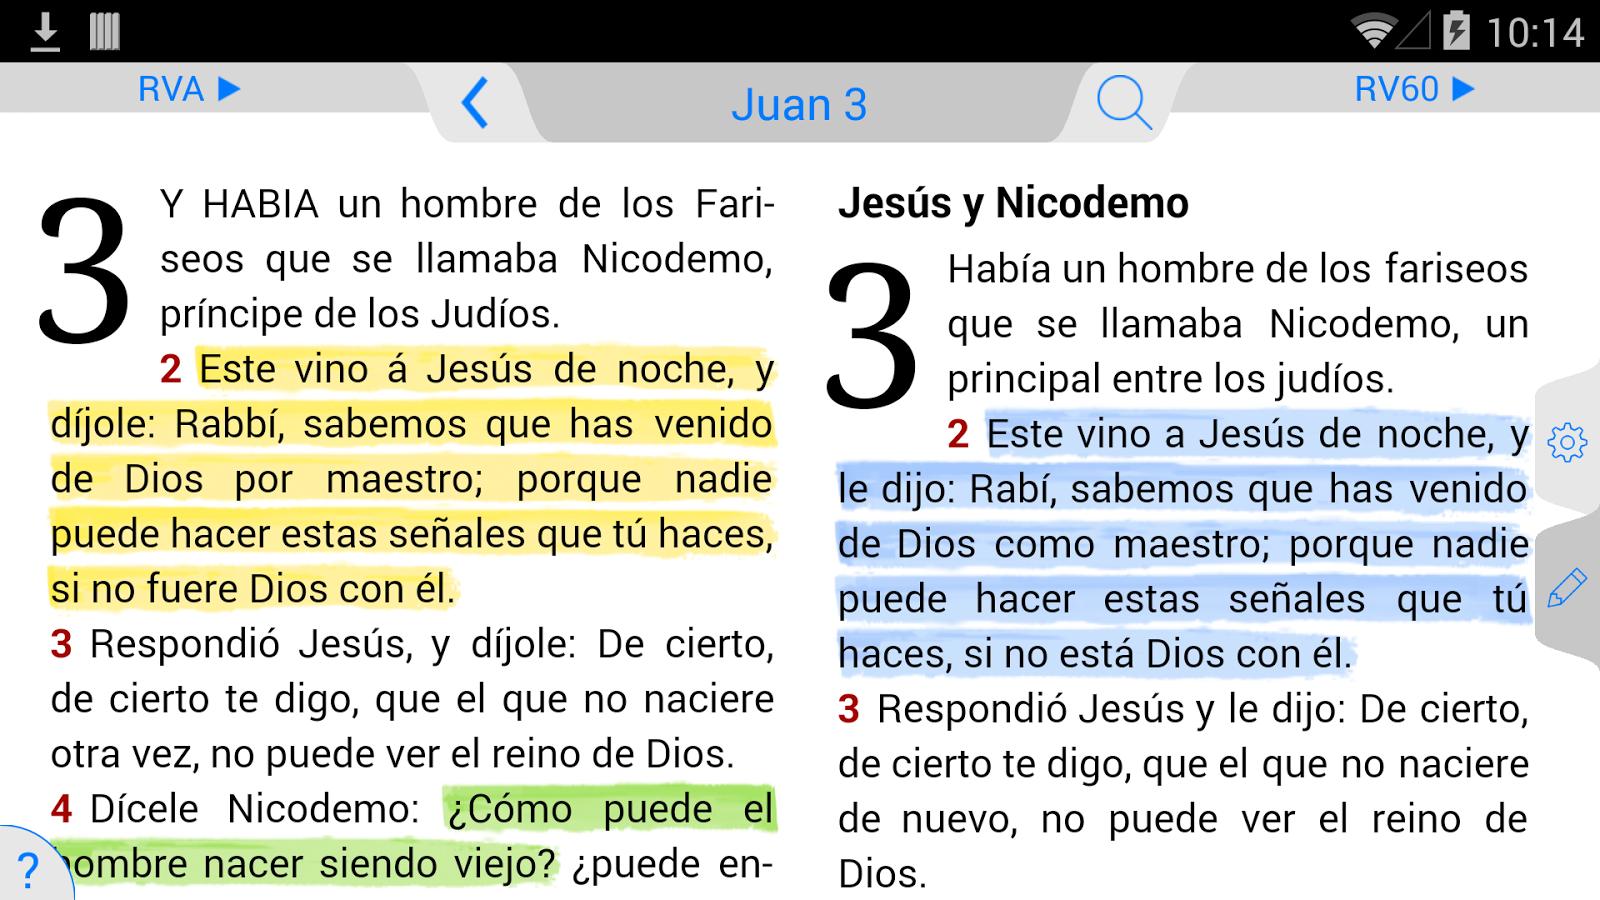 Matrimonio Biblia Versiculos Reina Valera : Biblia reina valera antigua android apps on google play